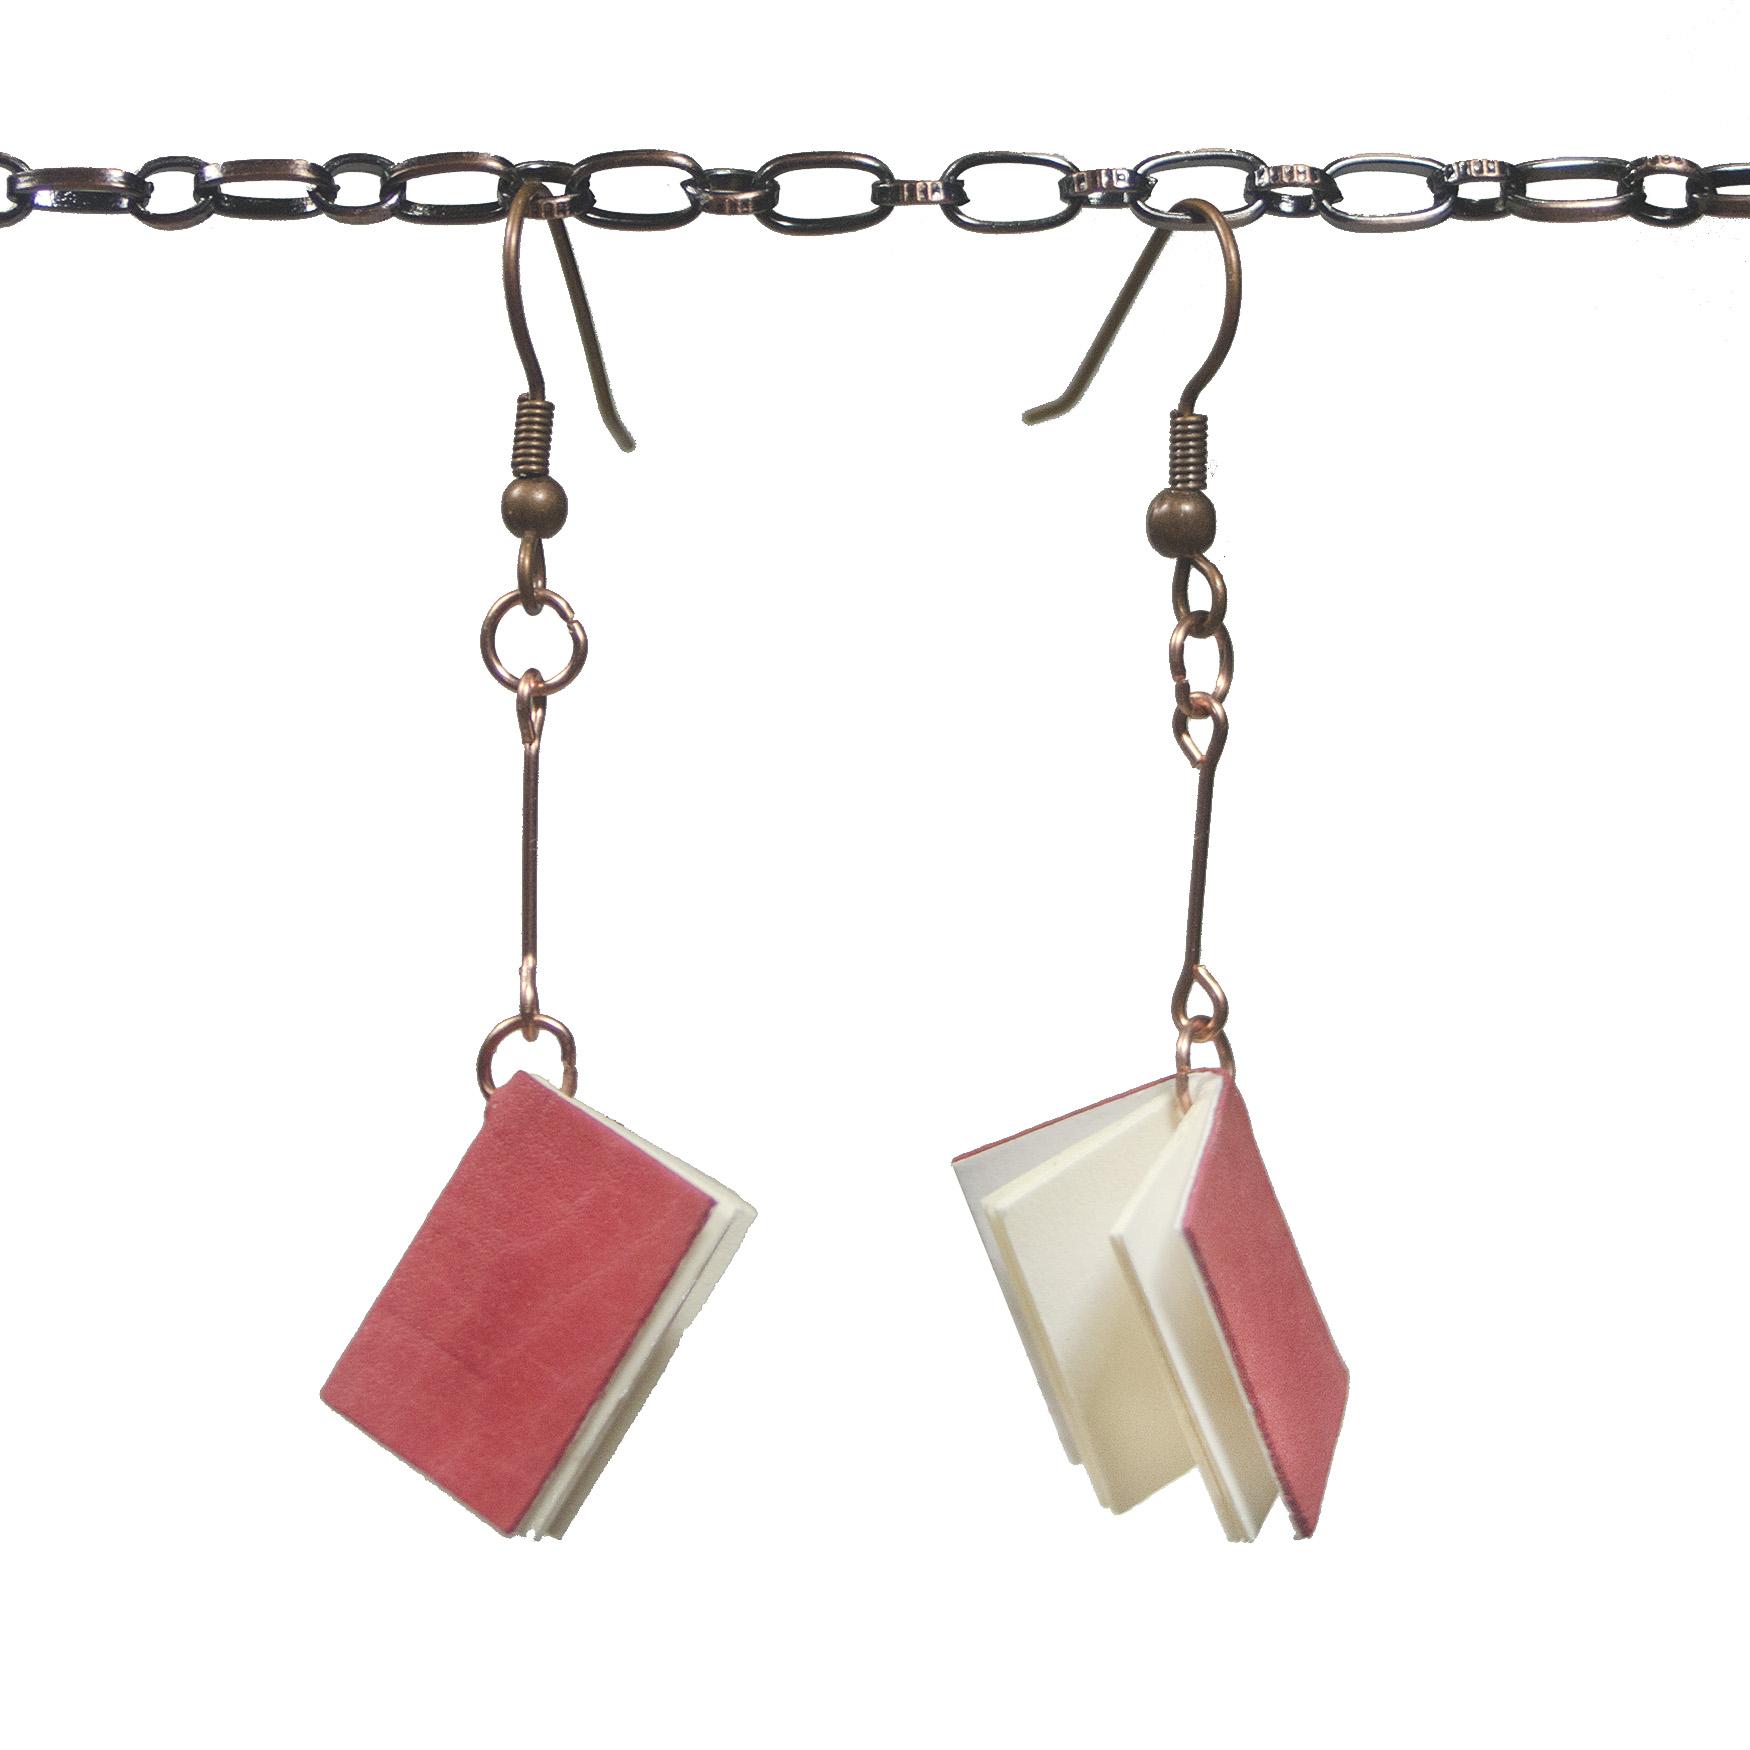 Handmade Leather Book Earrings